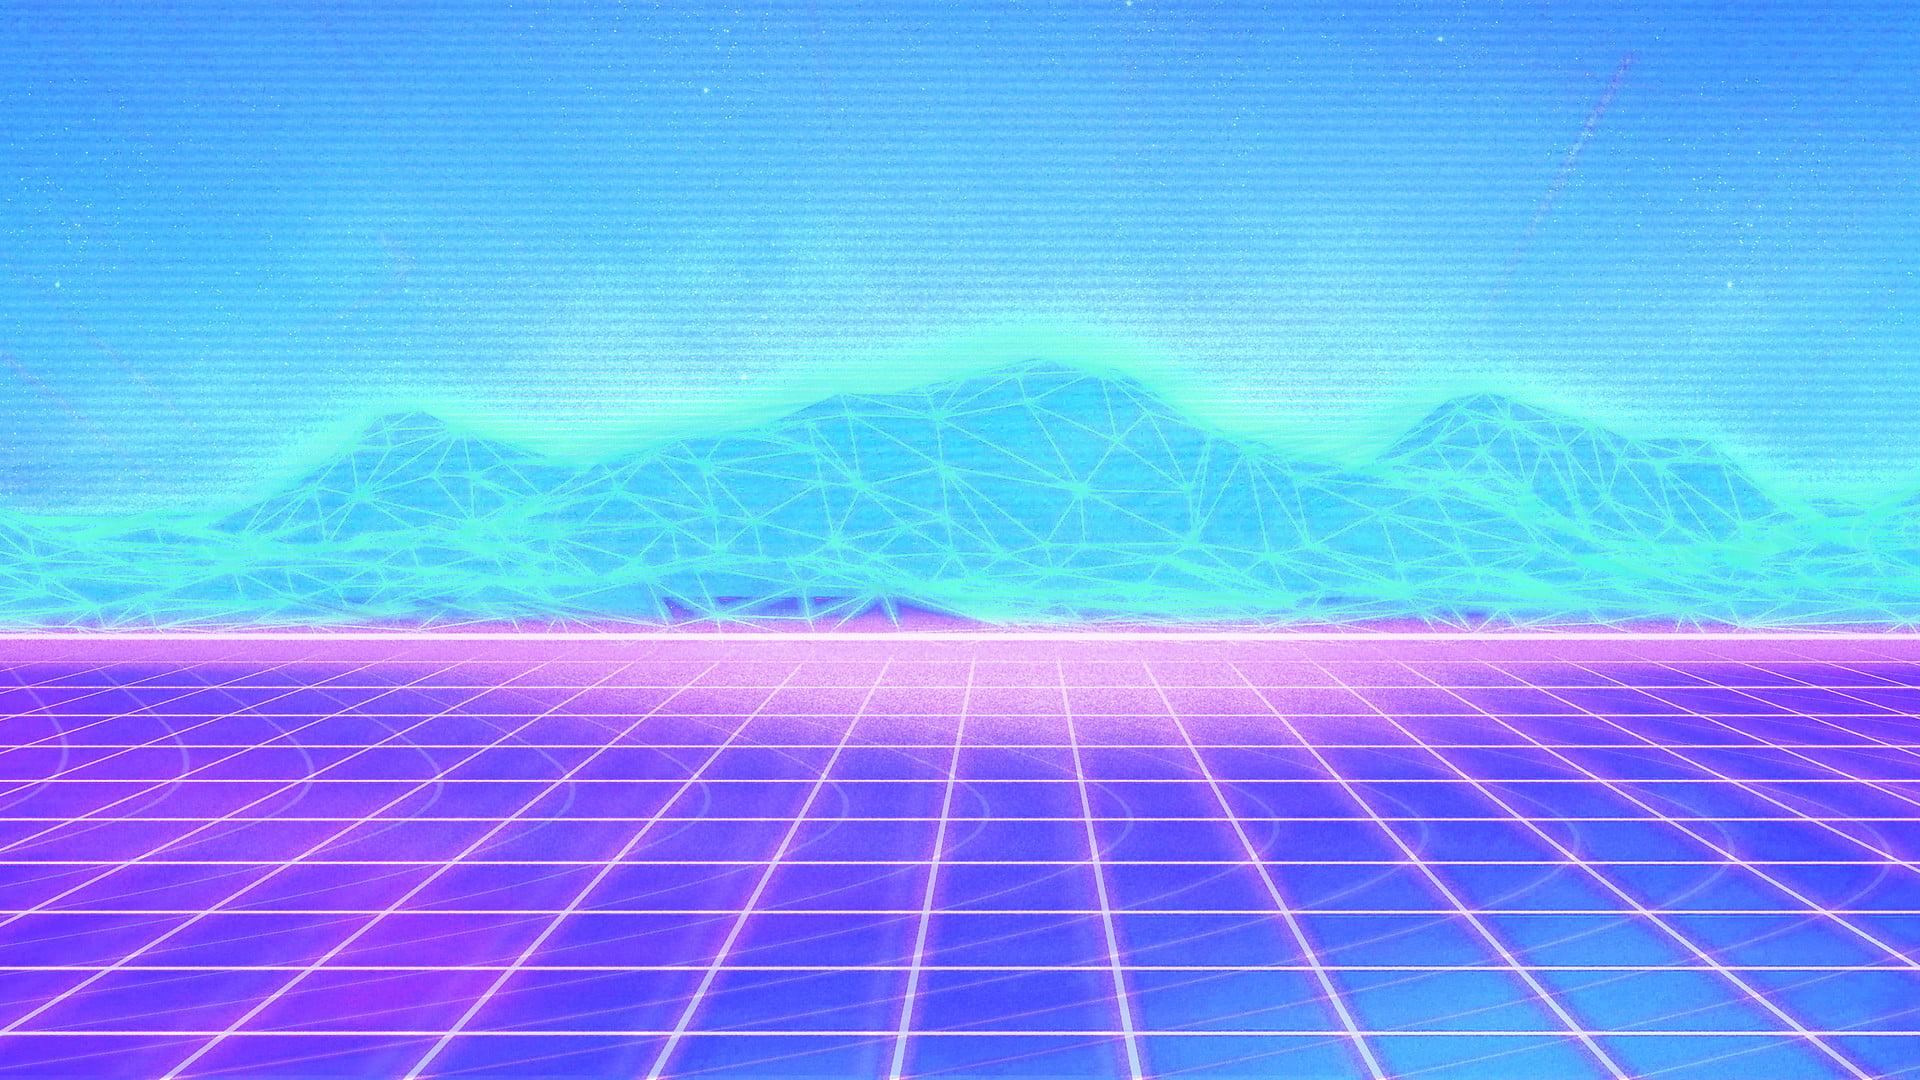 Vaporwave Hd Wallpapers Desktop Wallpaper Grid Vaporwave Background 1280x720 Download Hd Wallpaper Wallpapertip